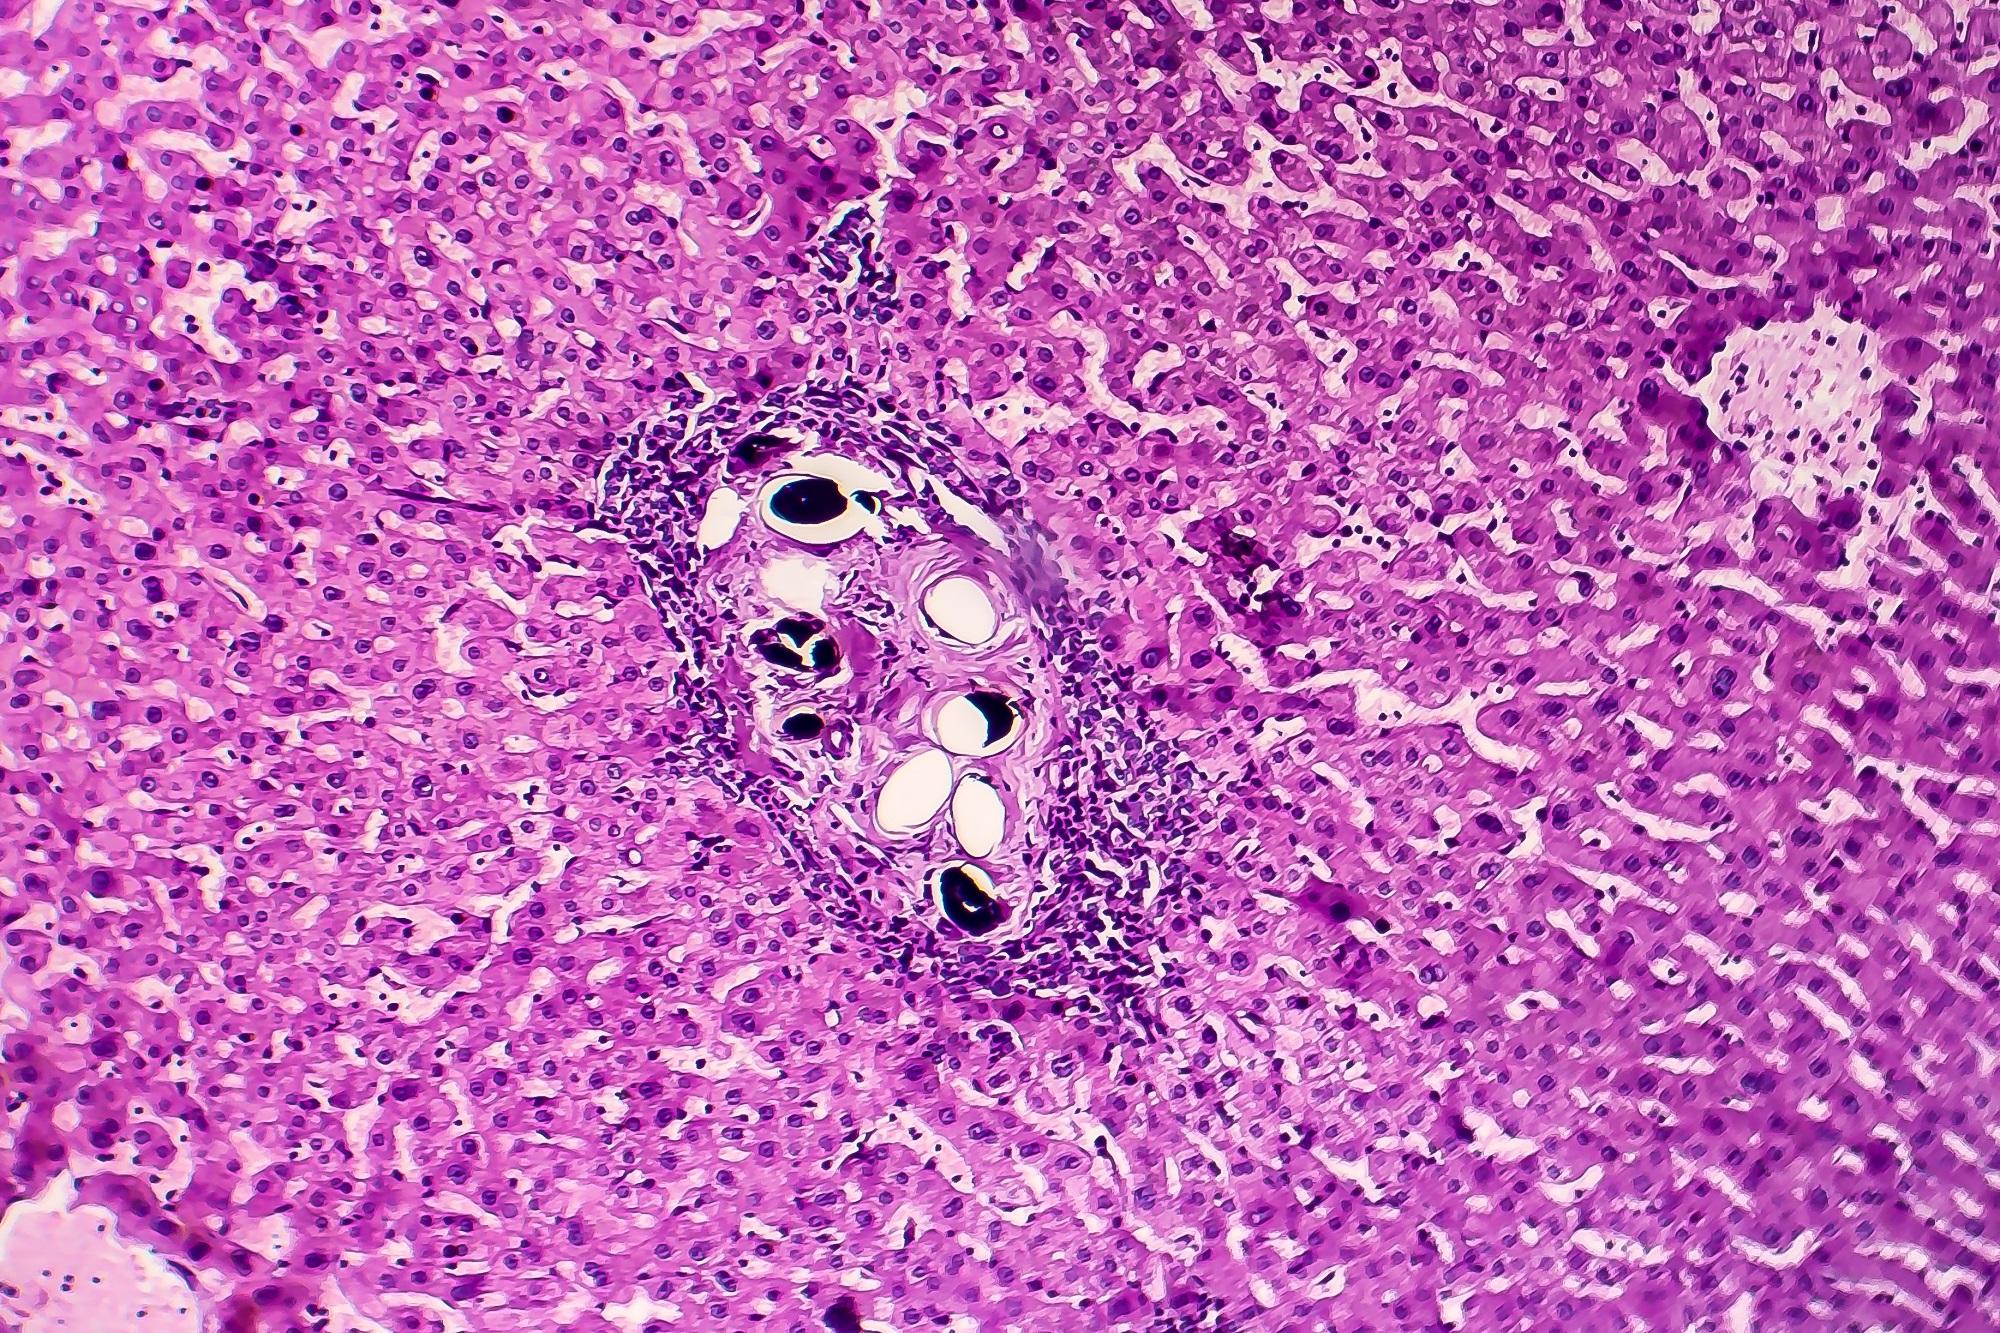 hepatitis c schistosomiasis poszter paraziták